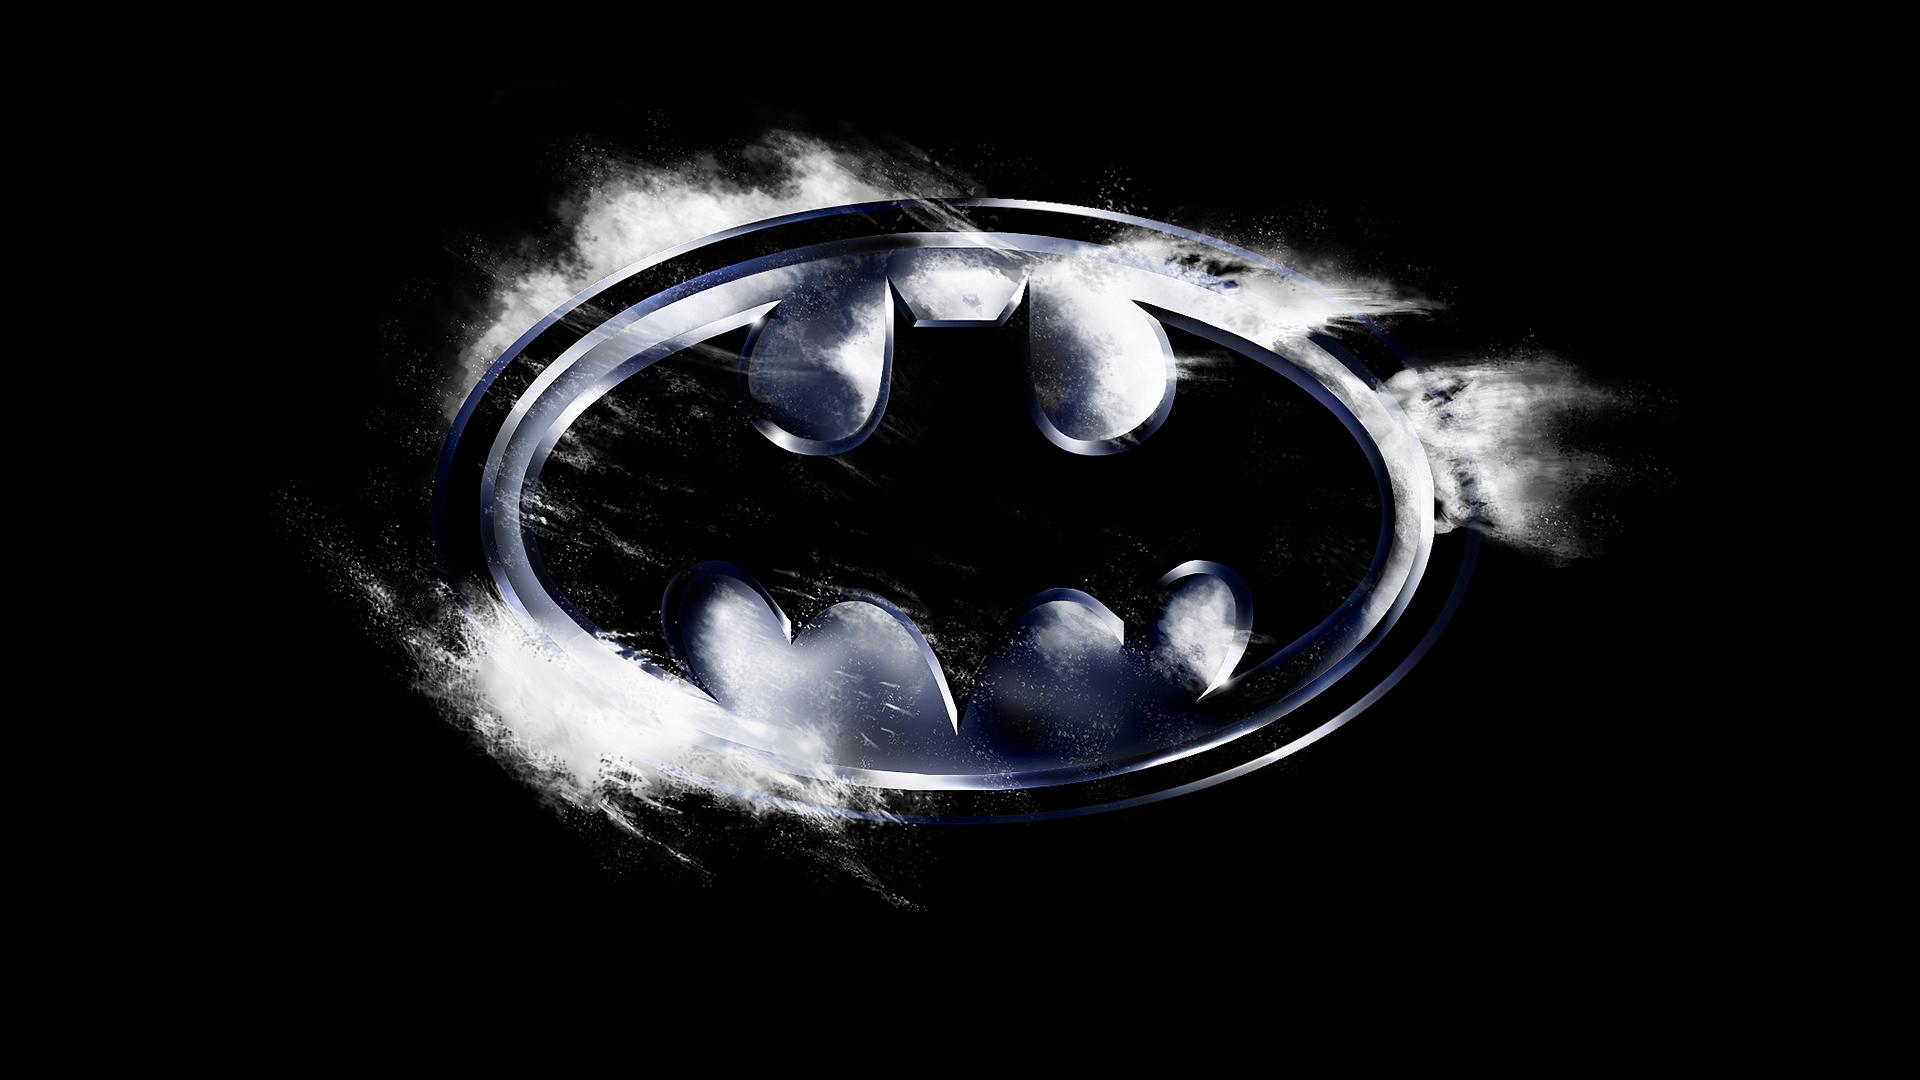 BATMAN RETURNS superhero logo wallpaper 1920x1080 101468 1920x1080